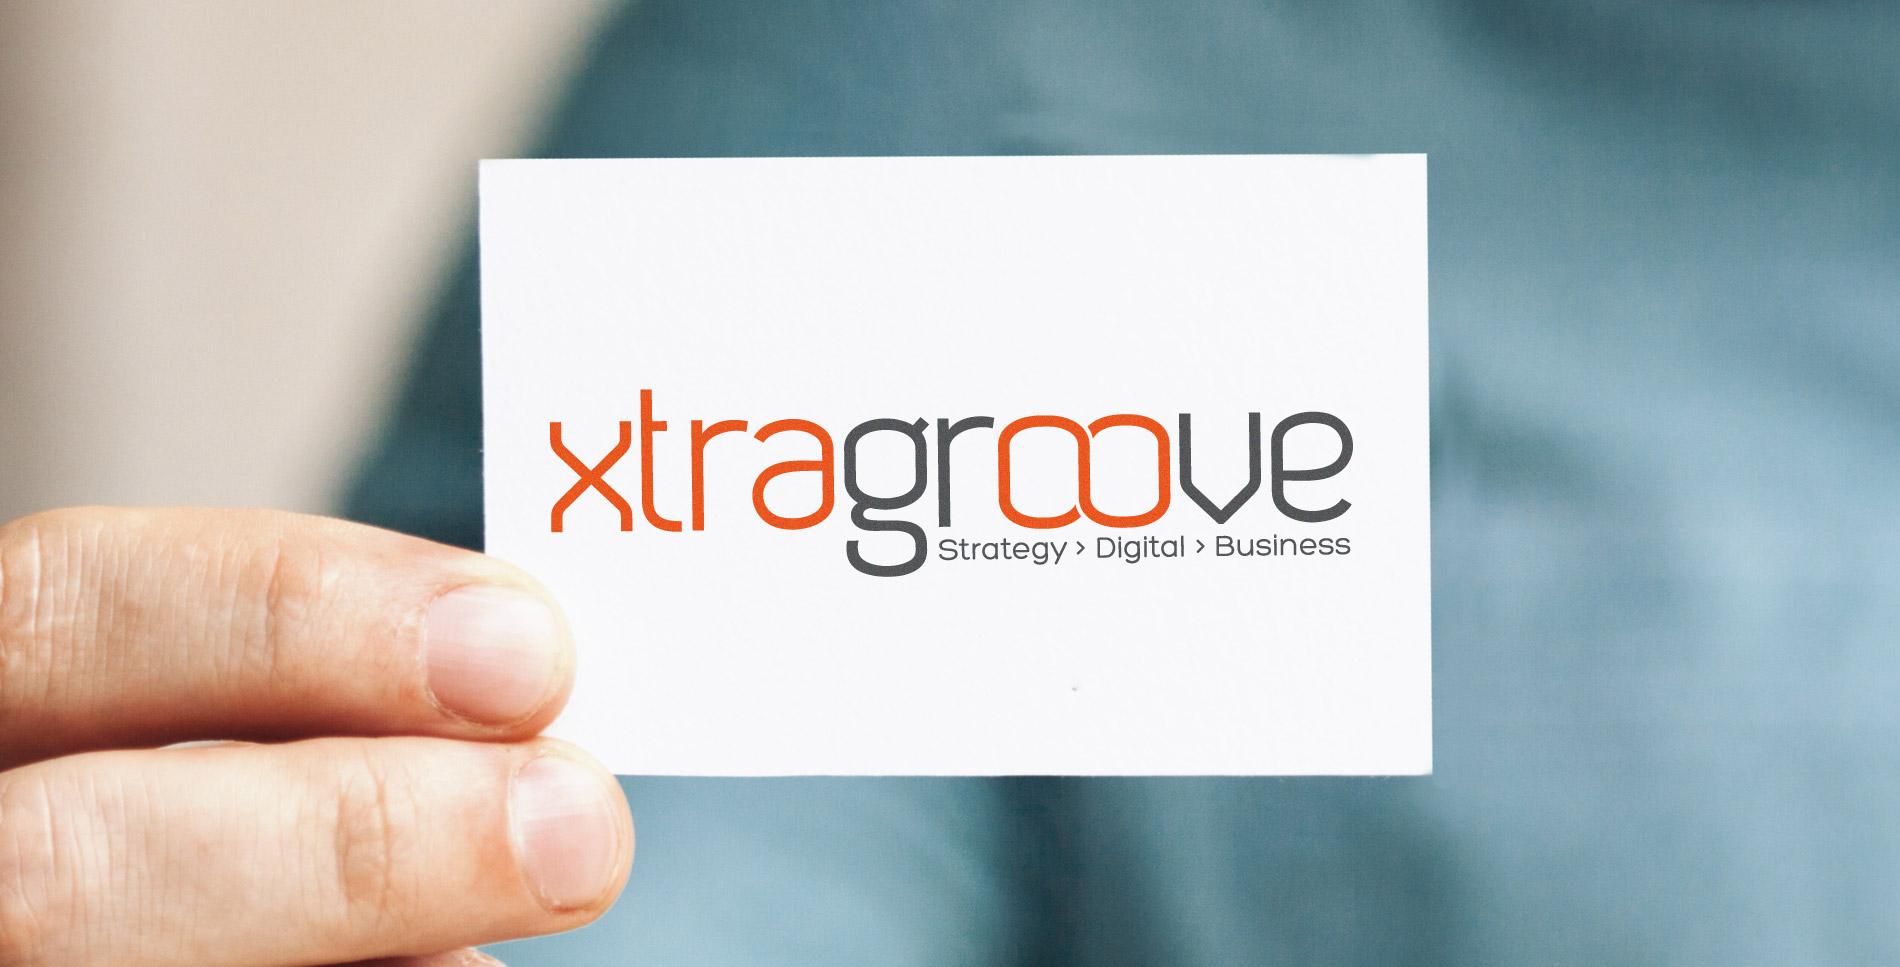 XtraGroove Logo photo - 1